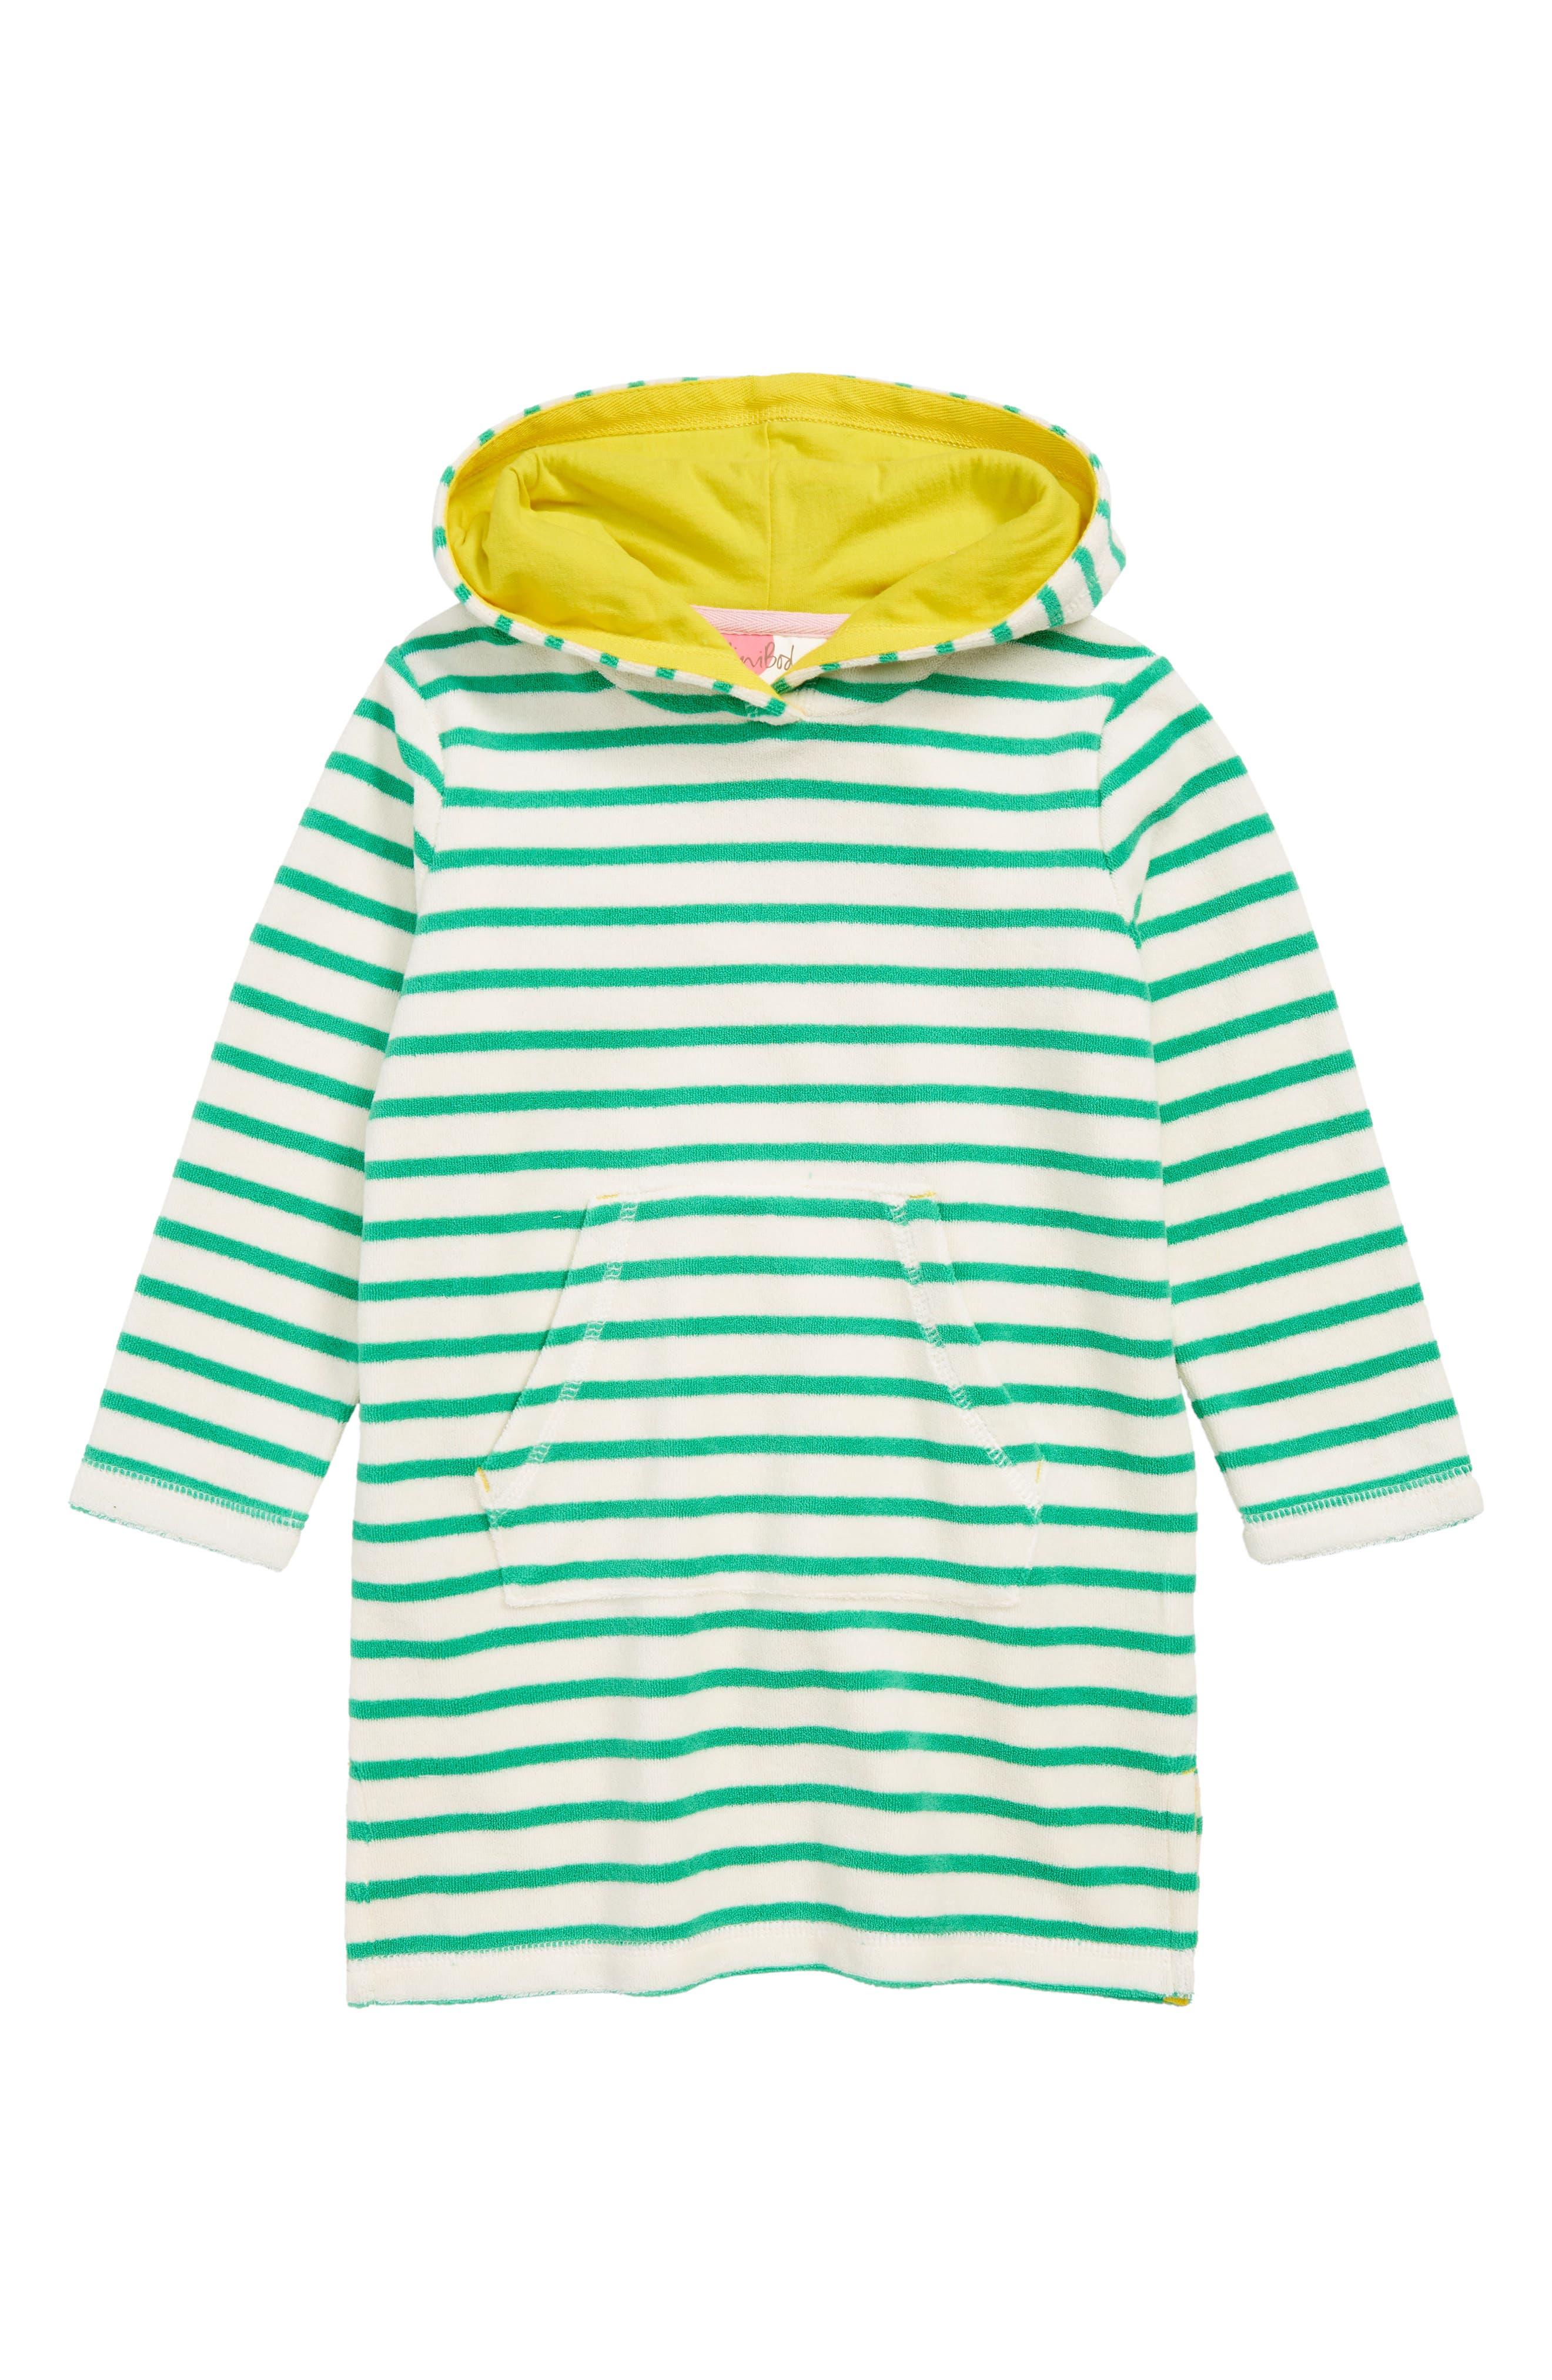 Stripy Terry Beach Cover-Up Dress, Main, color, 900